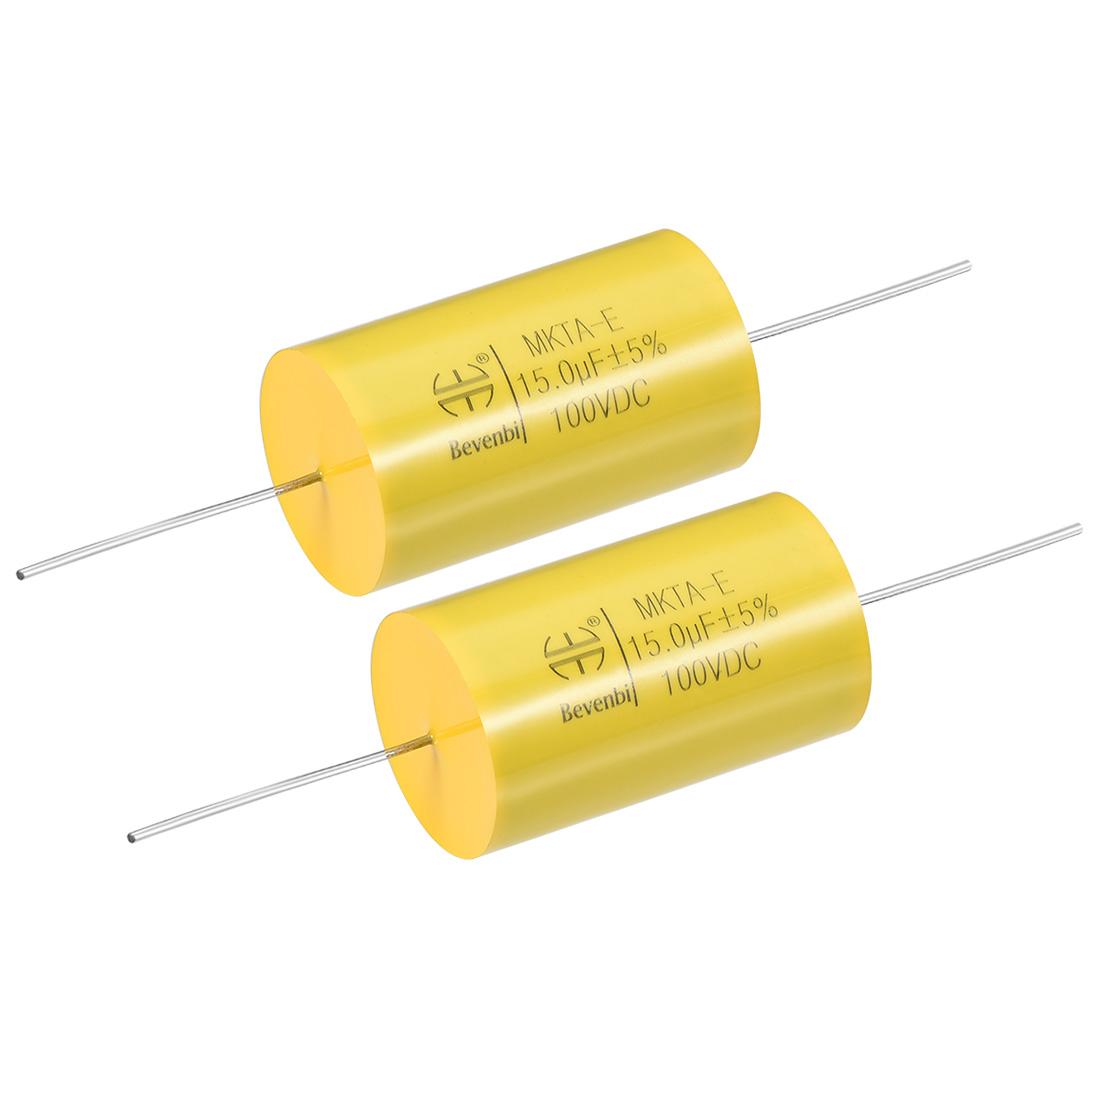 Film Capacitor 100V DC 15.0uF MKTA-E Round Polypropylene Capacitors Yellow 2pcs